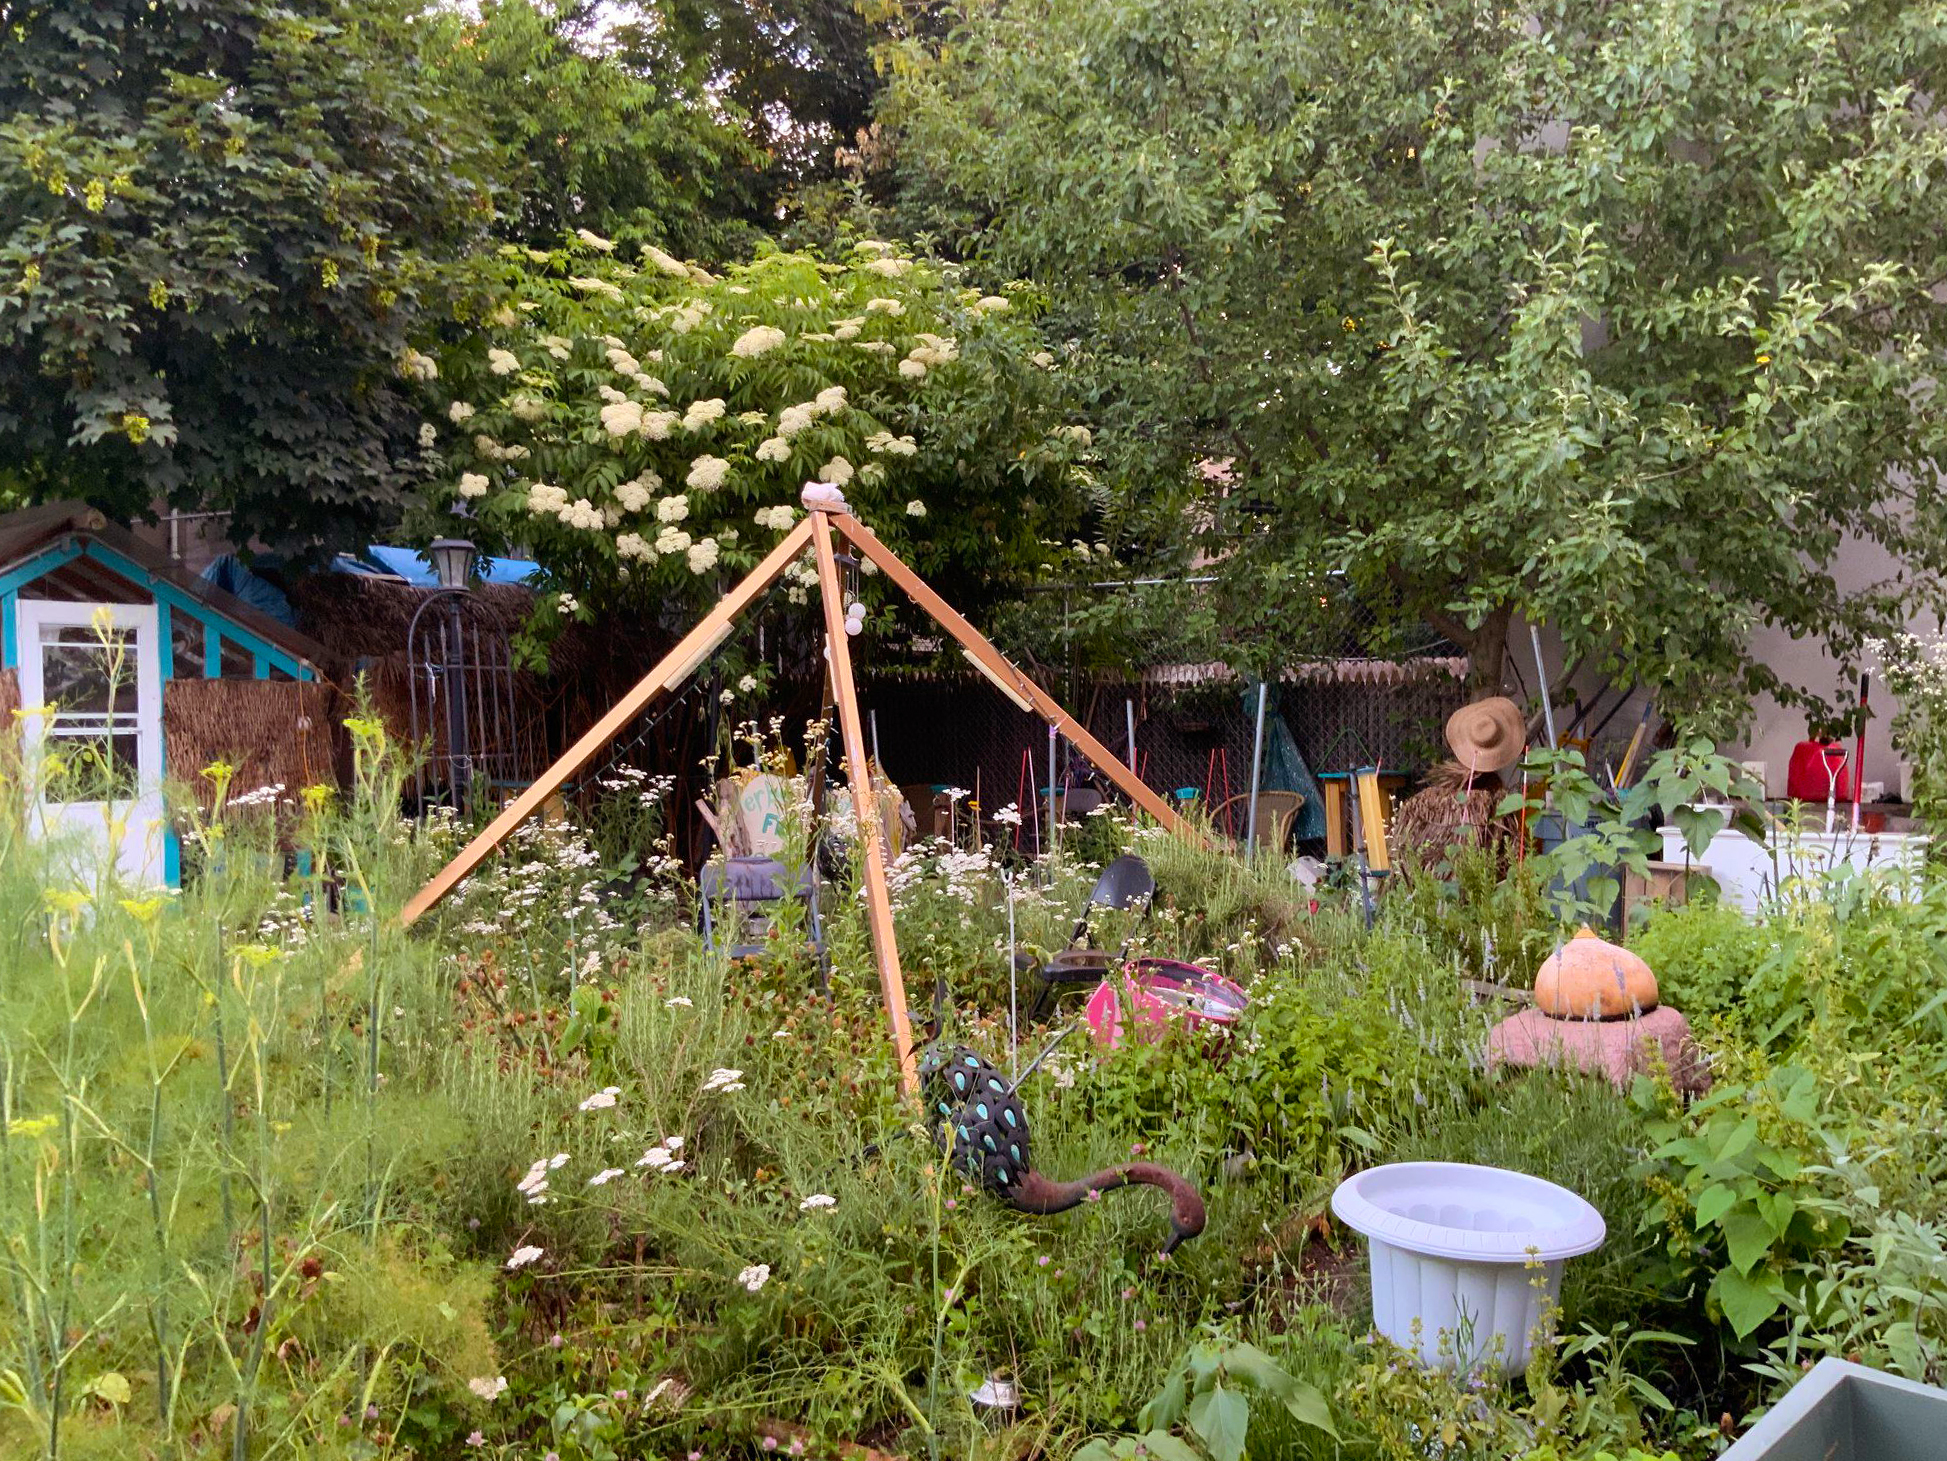 Hattie Carthan Community Garden Bed-Stuy